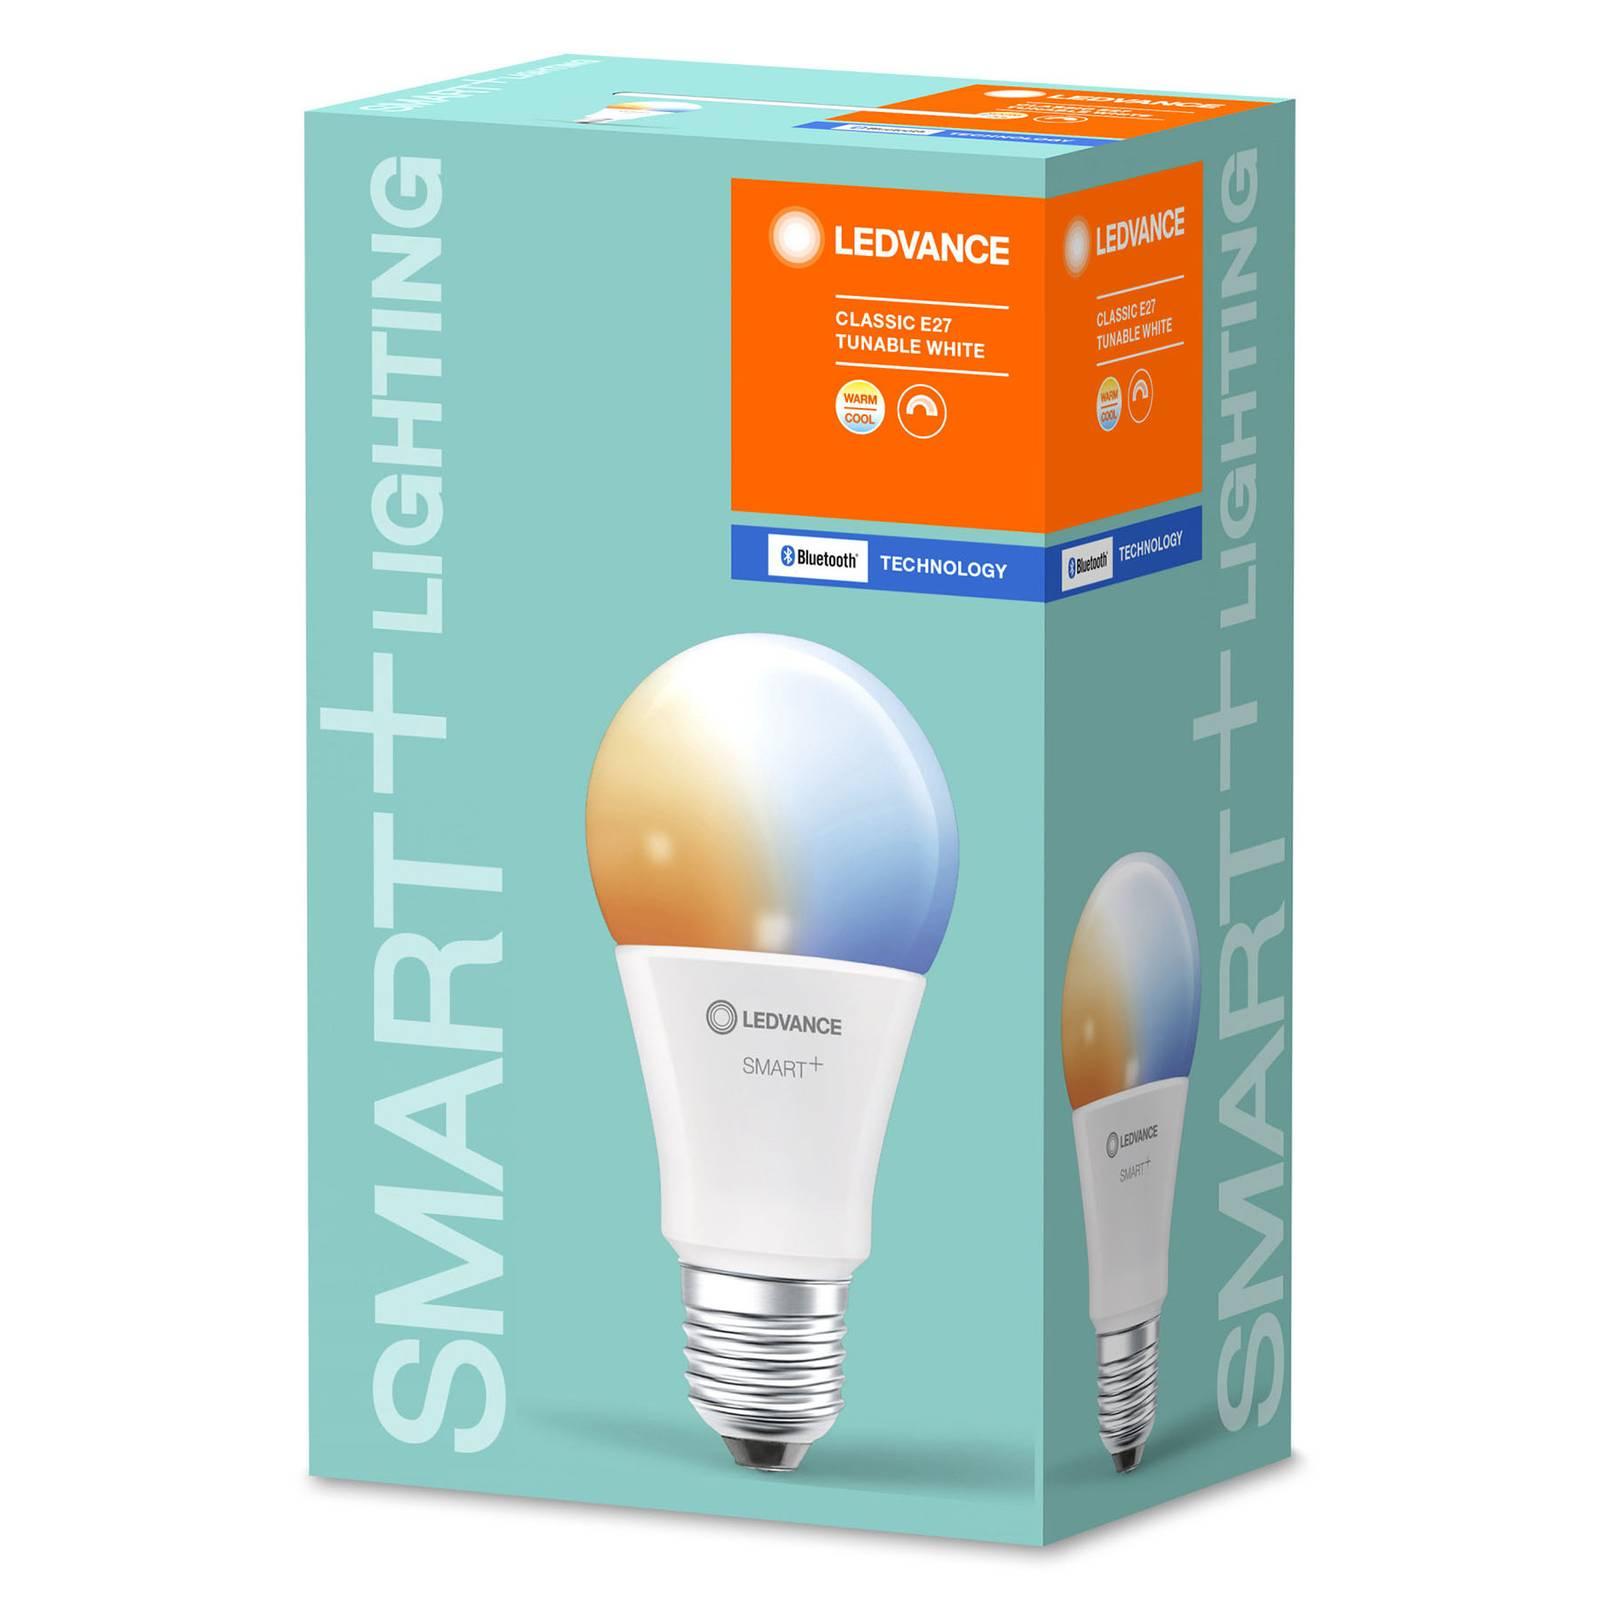 LEDVANCE SMART+ Bluetooth E27 LED Classic 9W CCT